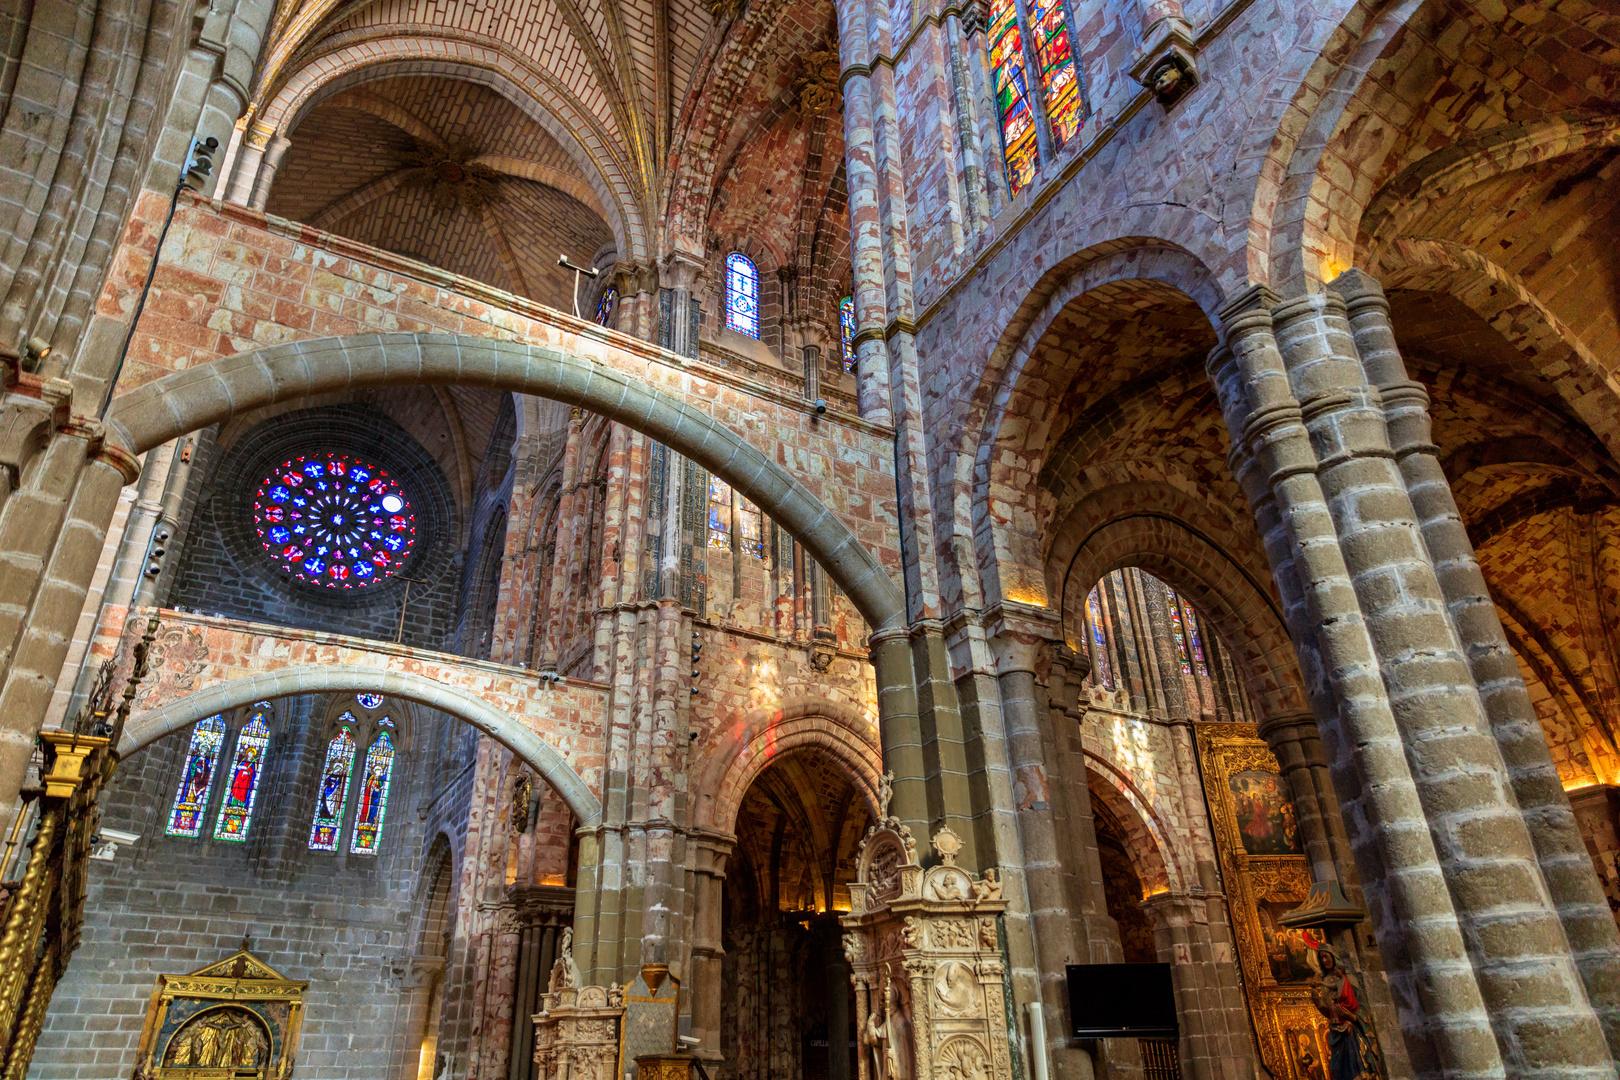 Interior catedral de avila imagen foto spain catedral for Catedral de durham interior